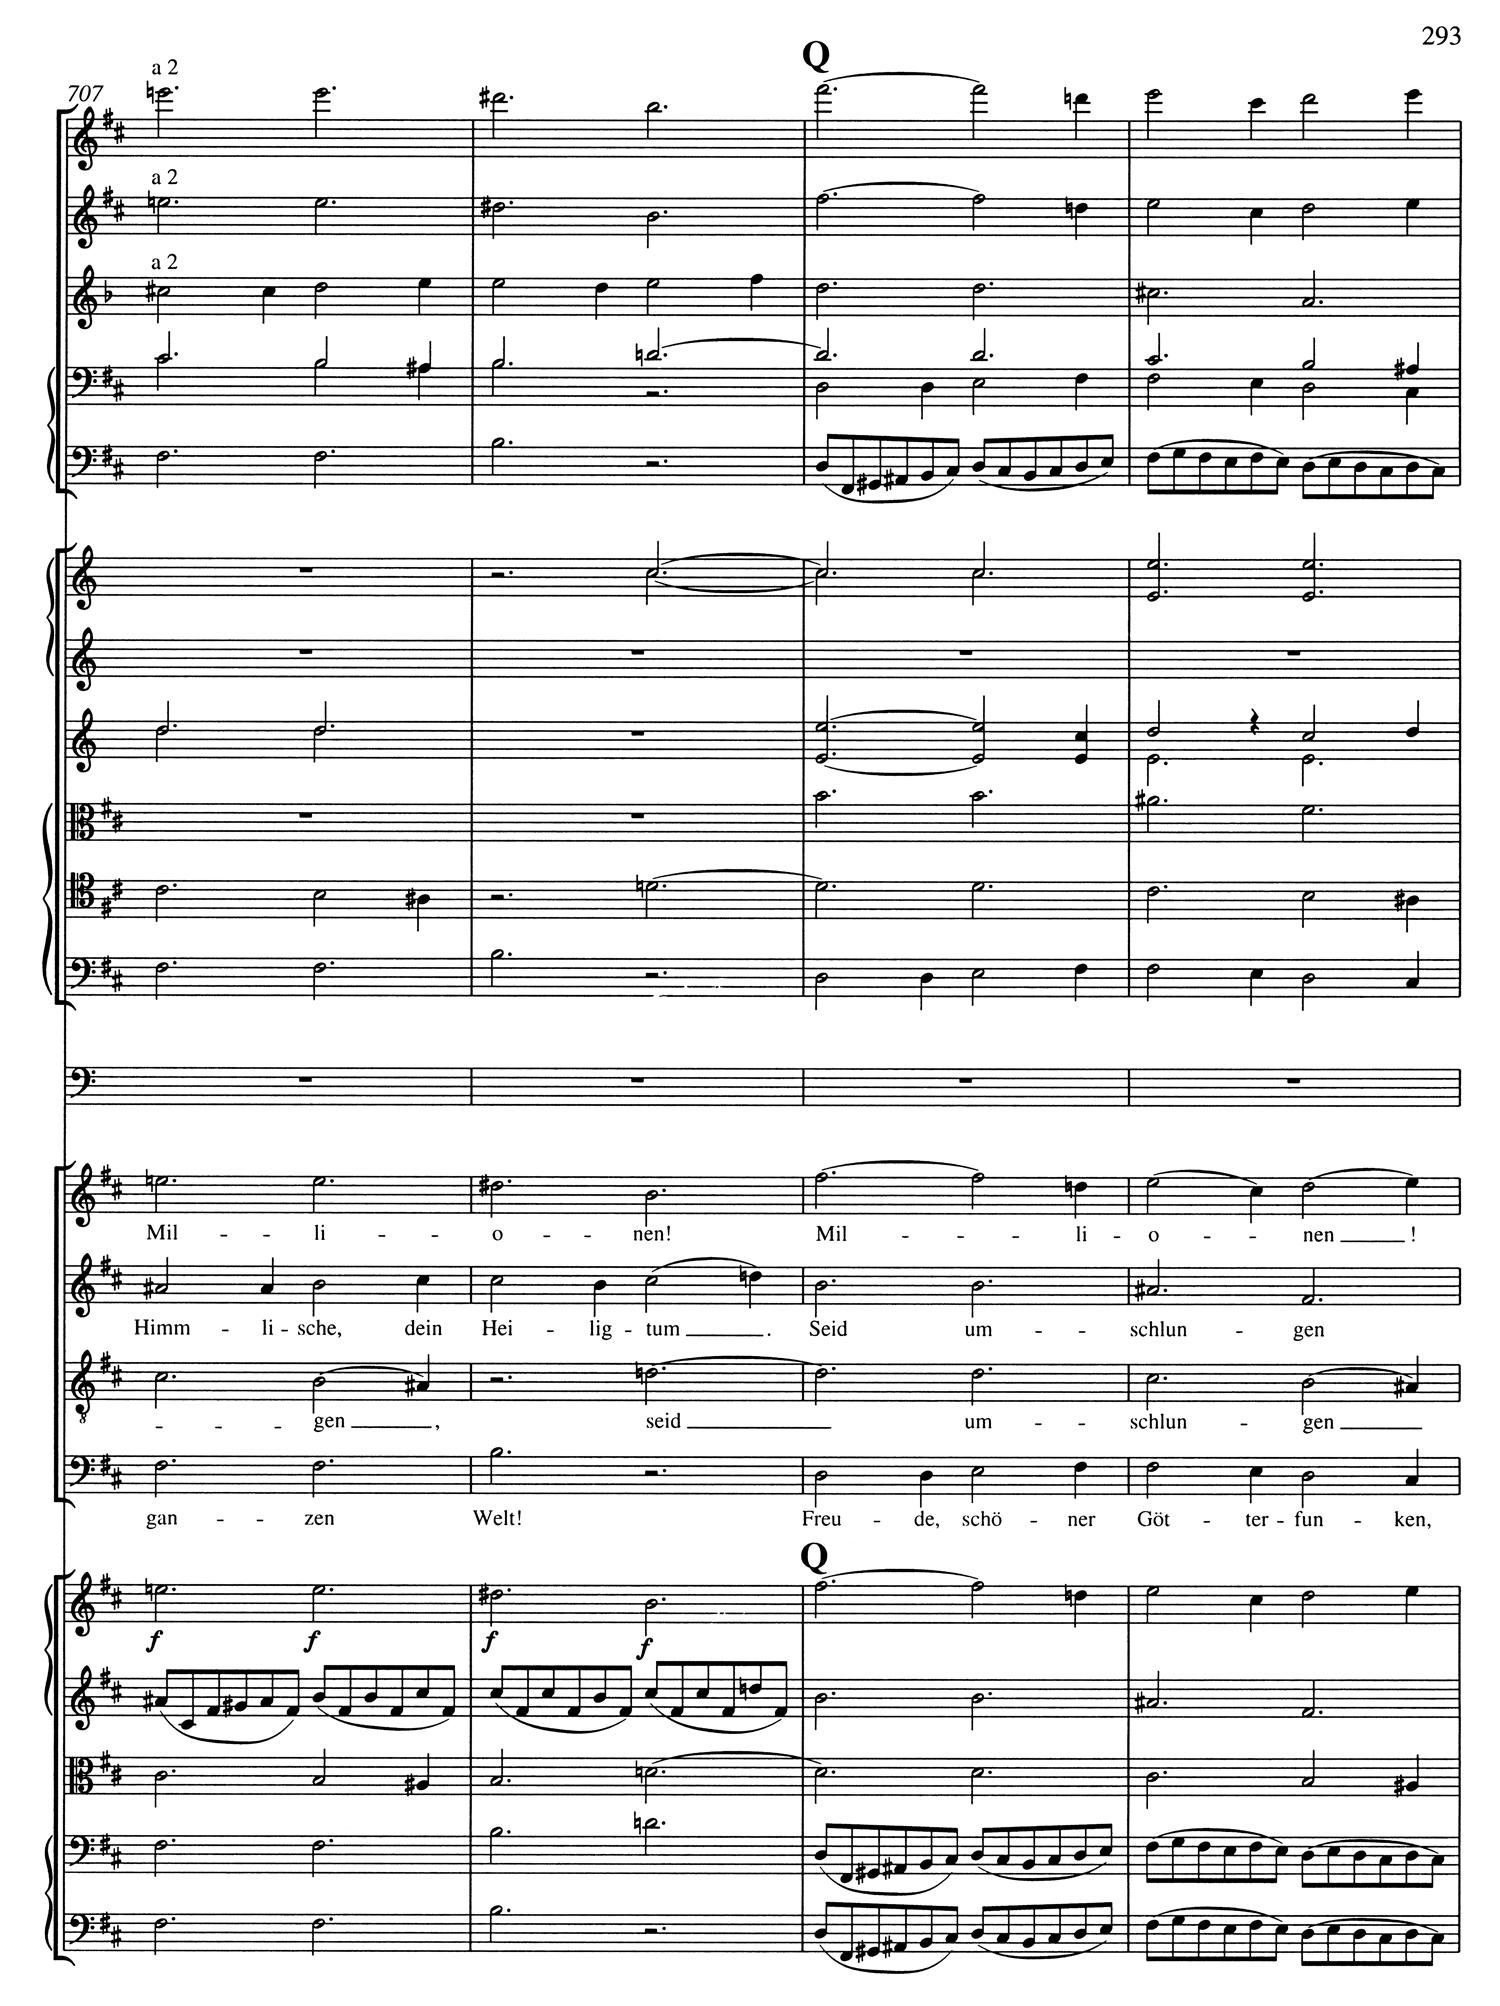 Beethoven 9 Contra Score 3.jpg